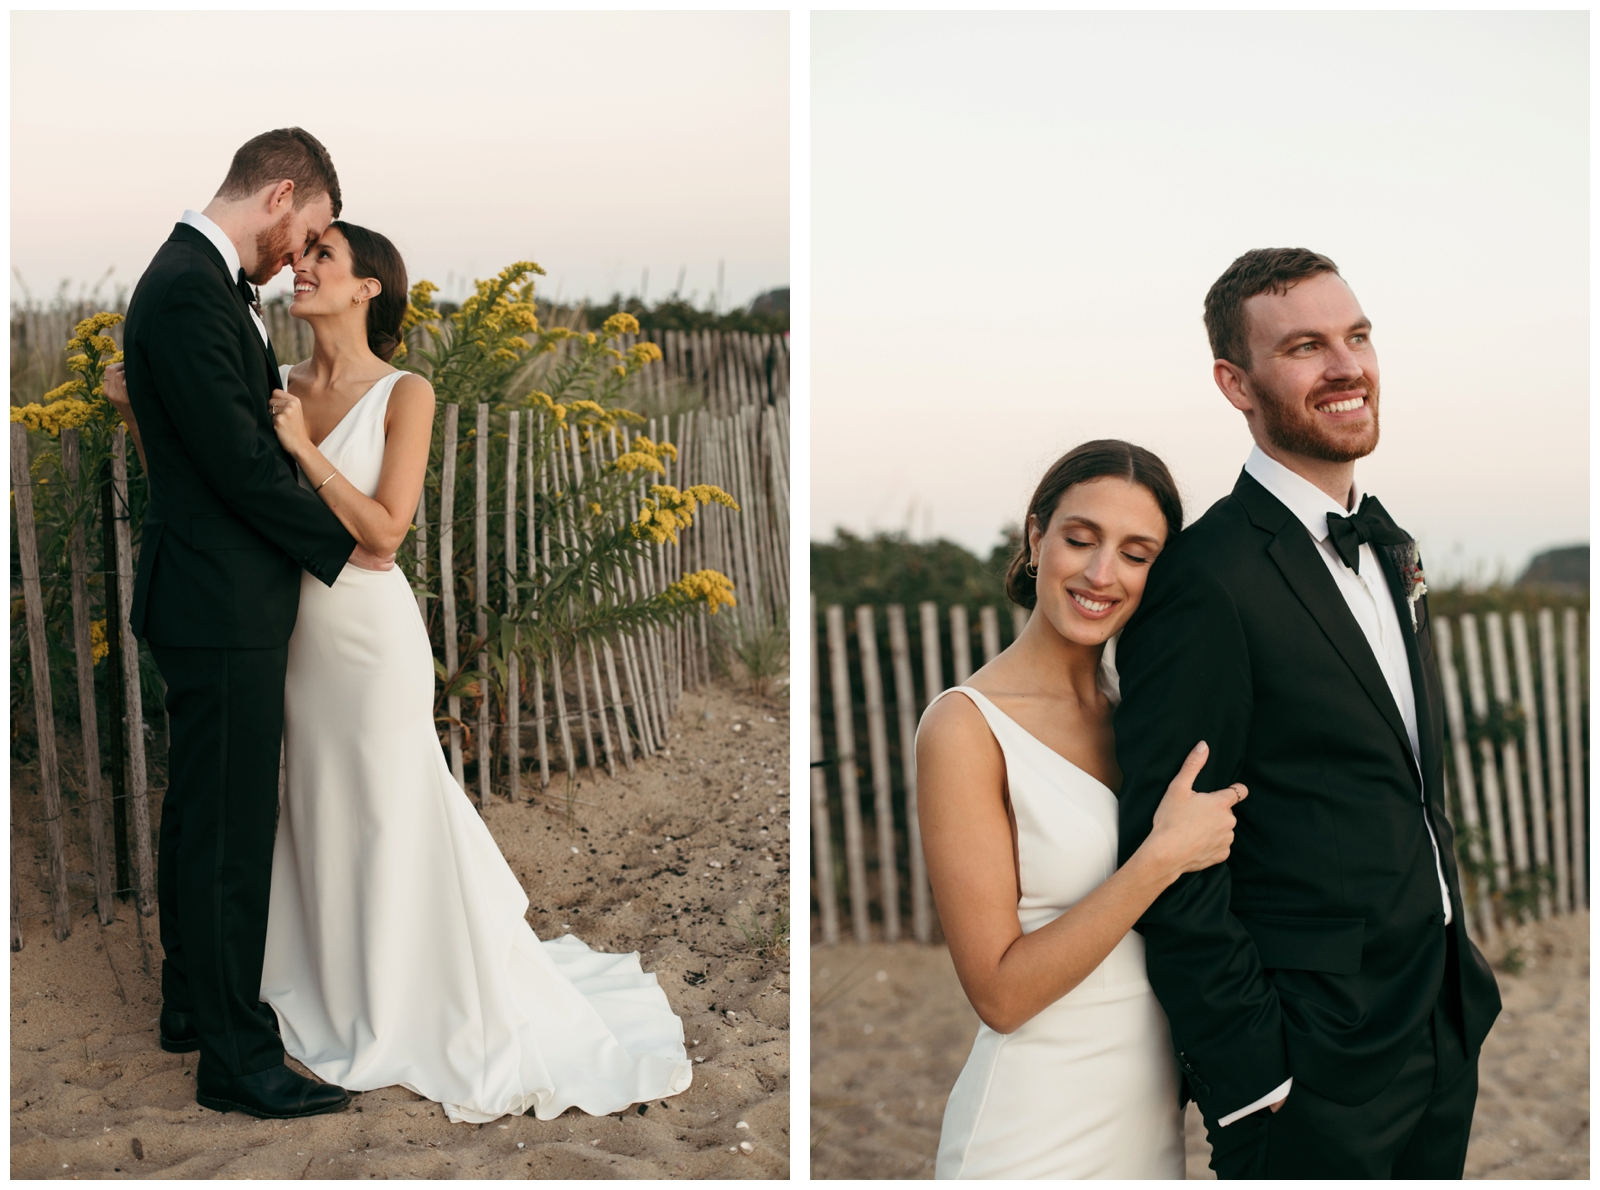 Madison-Beach-Hotel-Wedding-Bailey-Q-Photo-Boston-Wedding-Photographer-052.jpg